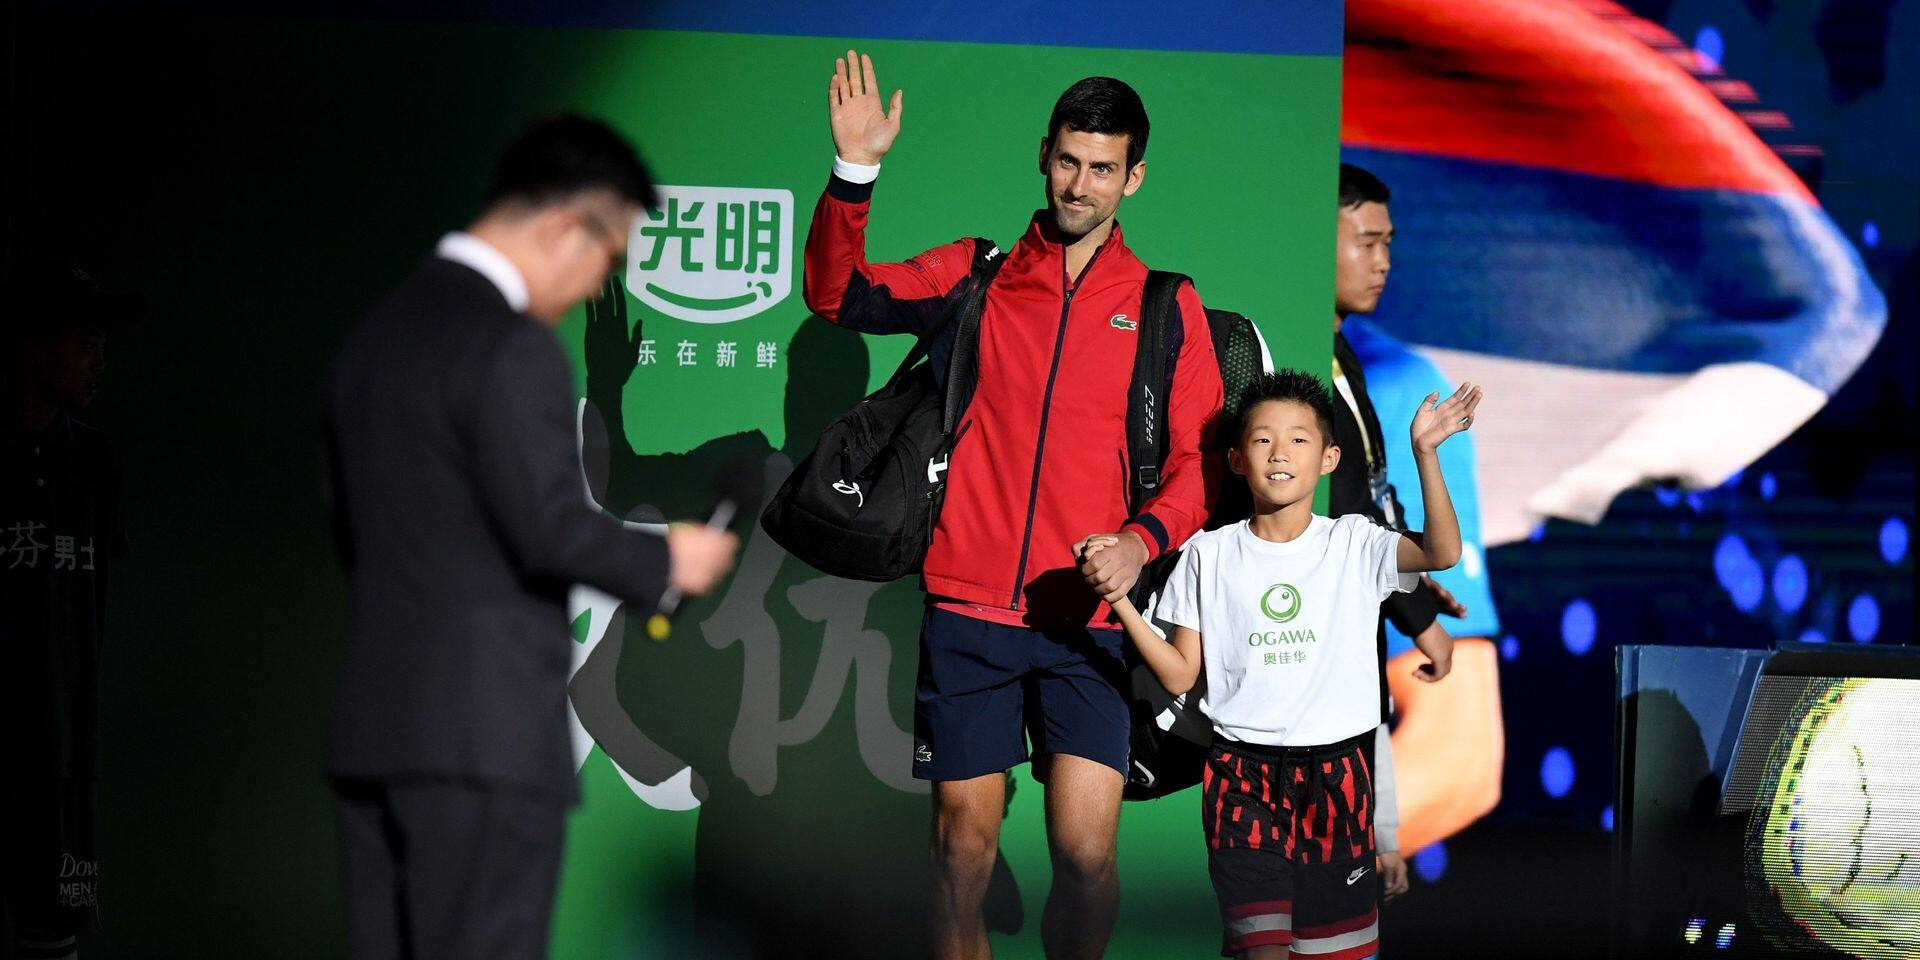 Masters 1000 de Shanghai: Djokovic continue d'impressionner